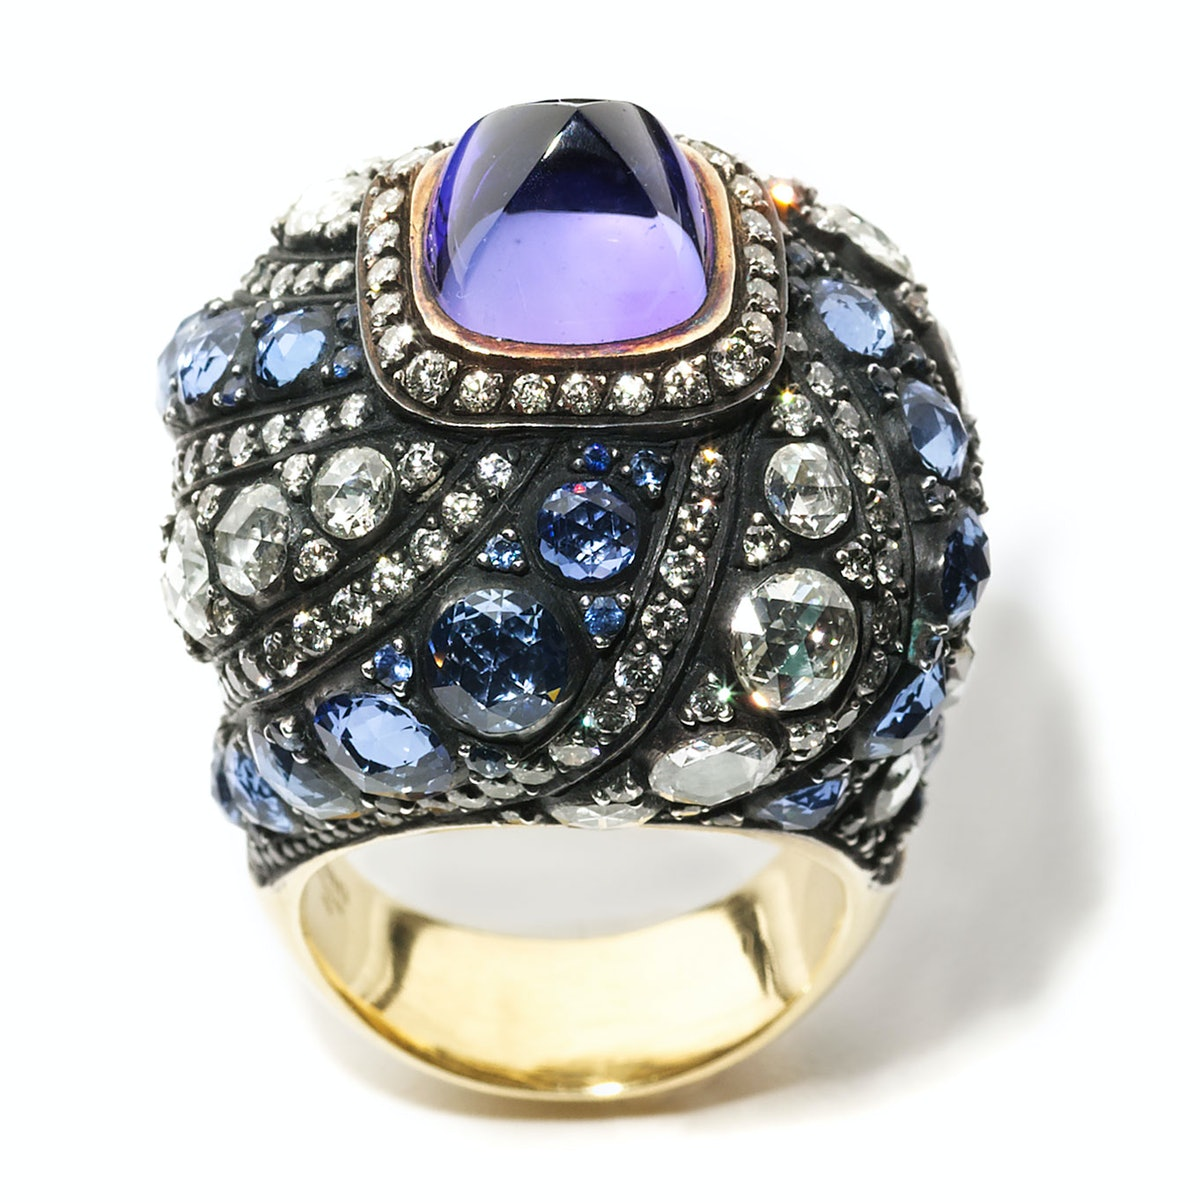 Gilan gold, tanzanite, sapphire, and diamond ring, $65200, [Bergdorf Goodman](http://www.bergdorfgoodman.com), New York, 212.753.7300.